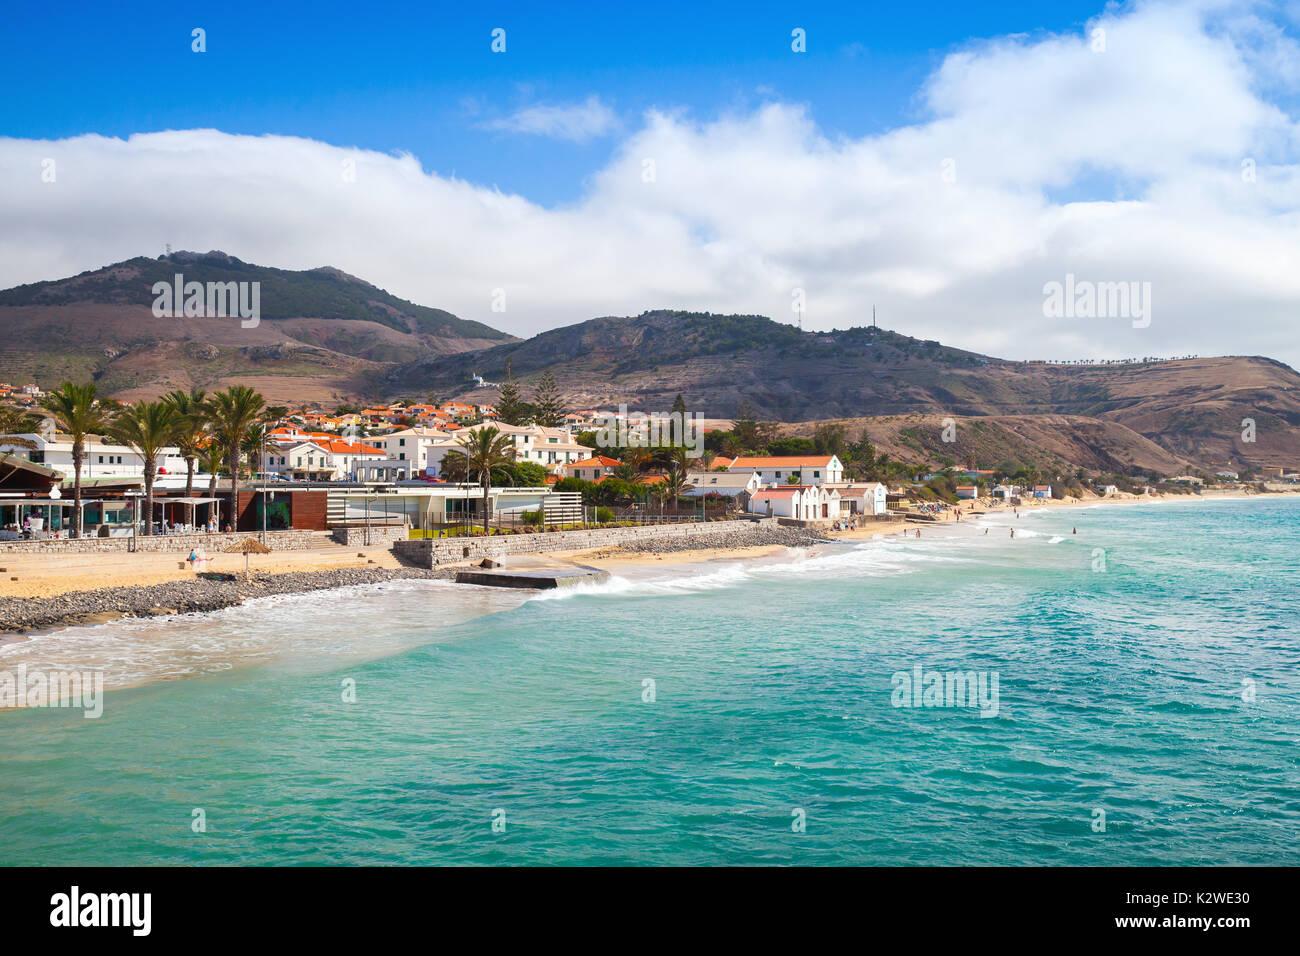 Vila Baleira coast. Landscape of the island of Porto Santo in the Madeira archipelago - Stock Image